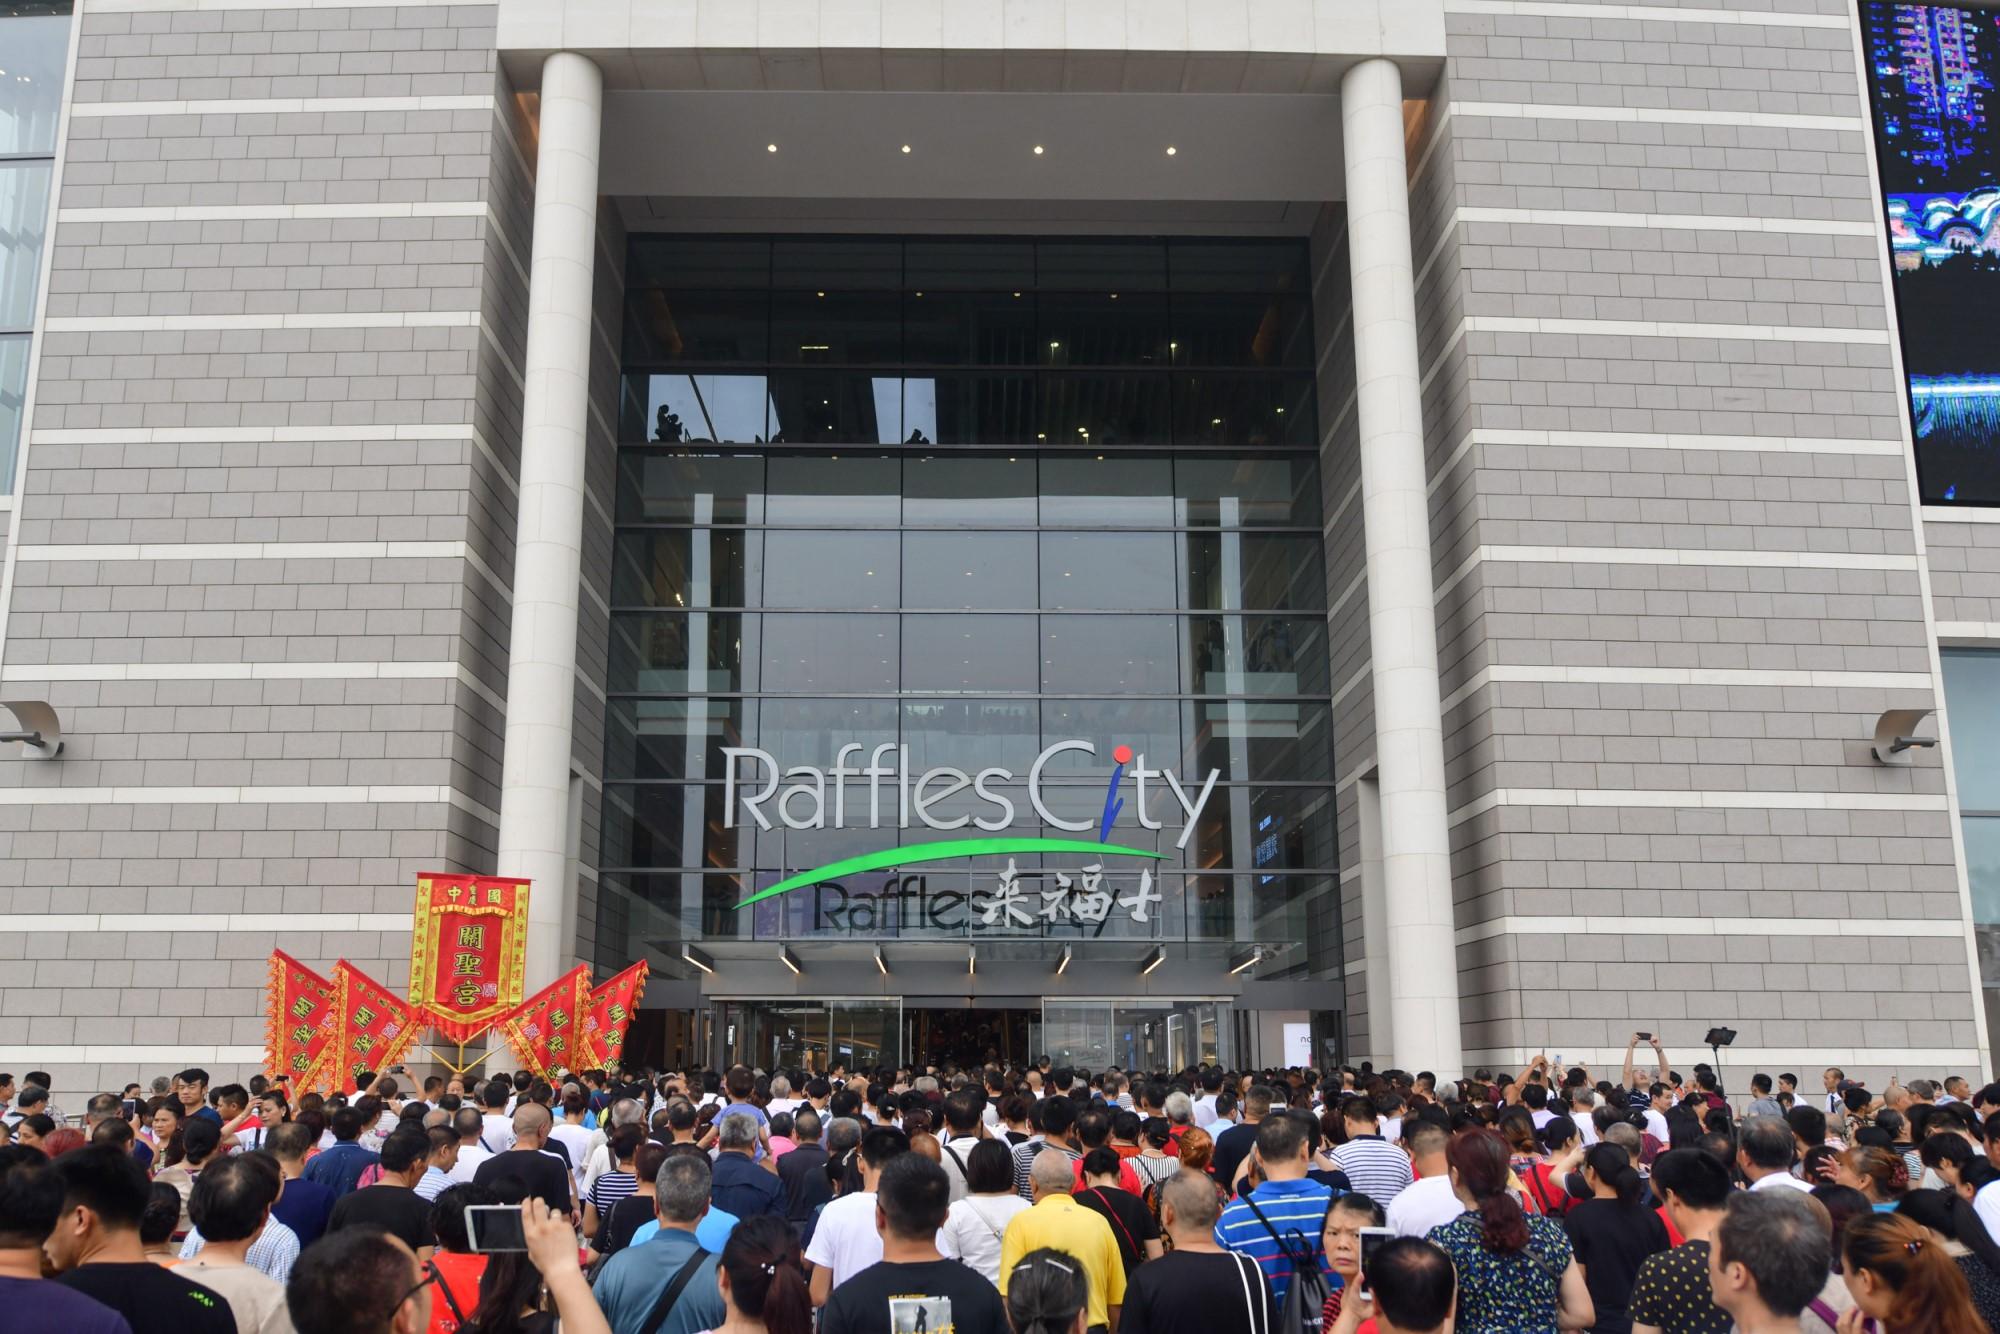 Raffles City Chongqing opening crowd (Credit: CapitaLand)